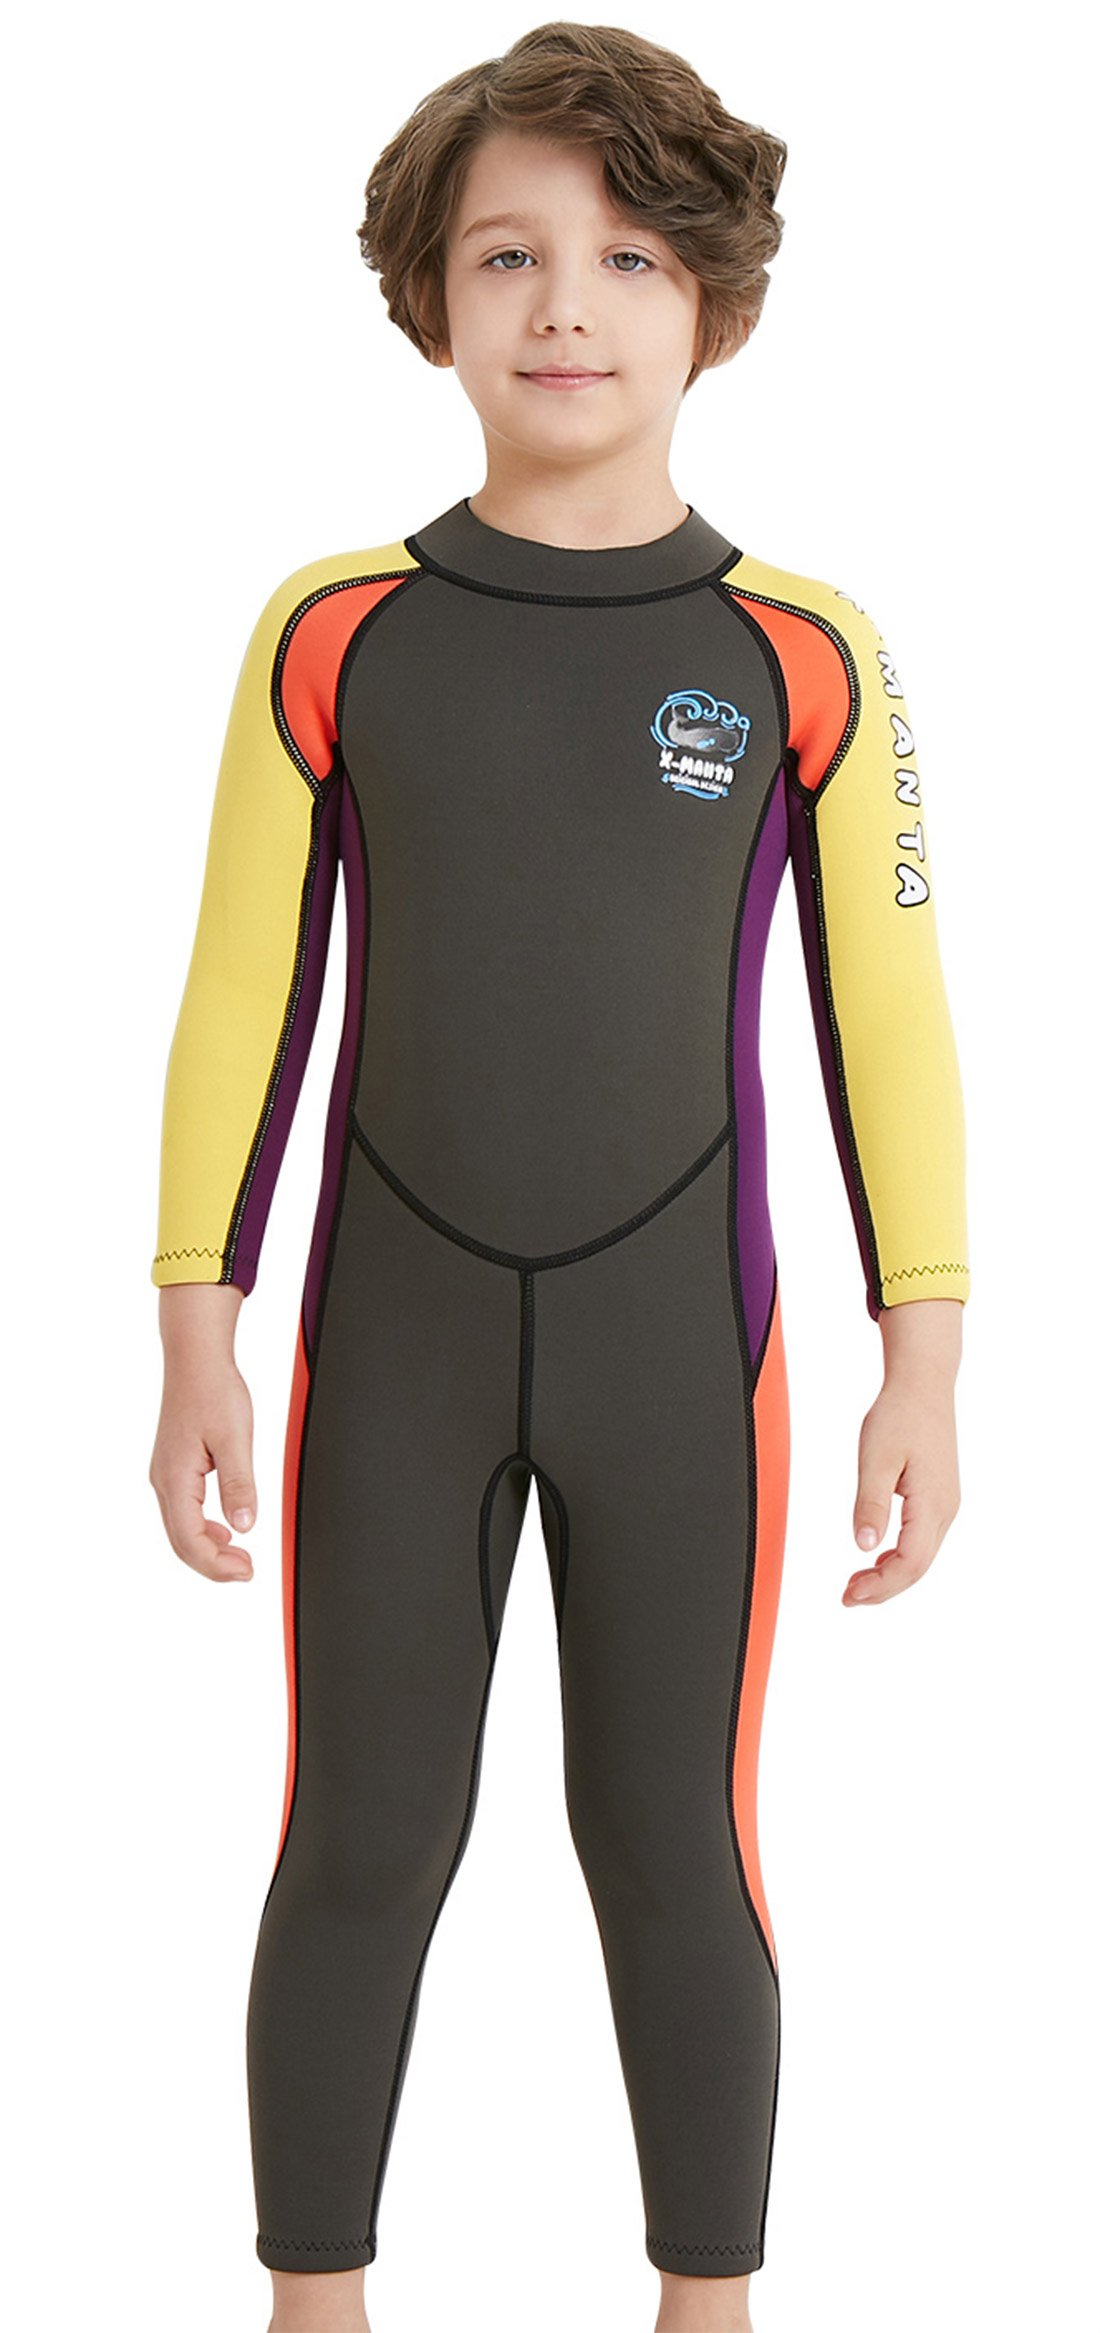 DIVE & SAIL Boys 2.5mm Diving Suit Warm Long Sleeve Full Wetsuit Back Zipper One Piece Swimsuit Grey S